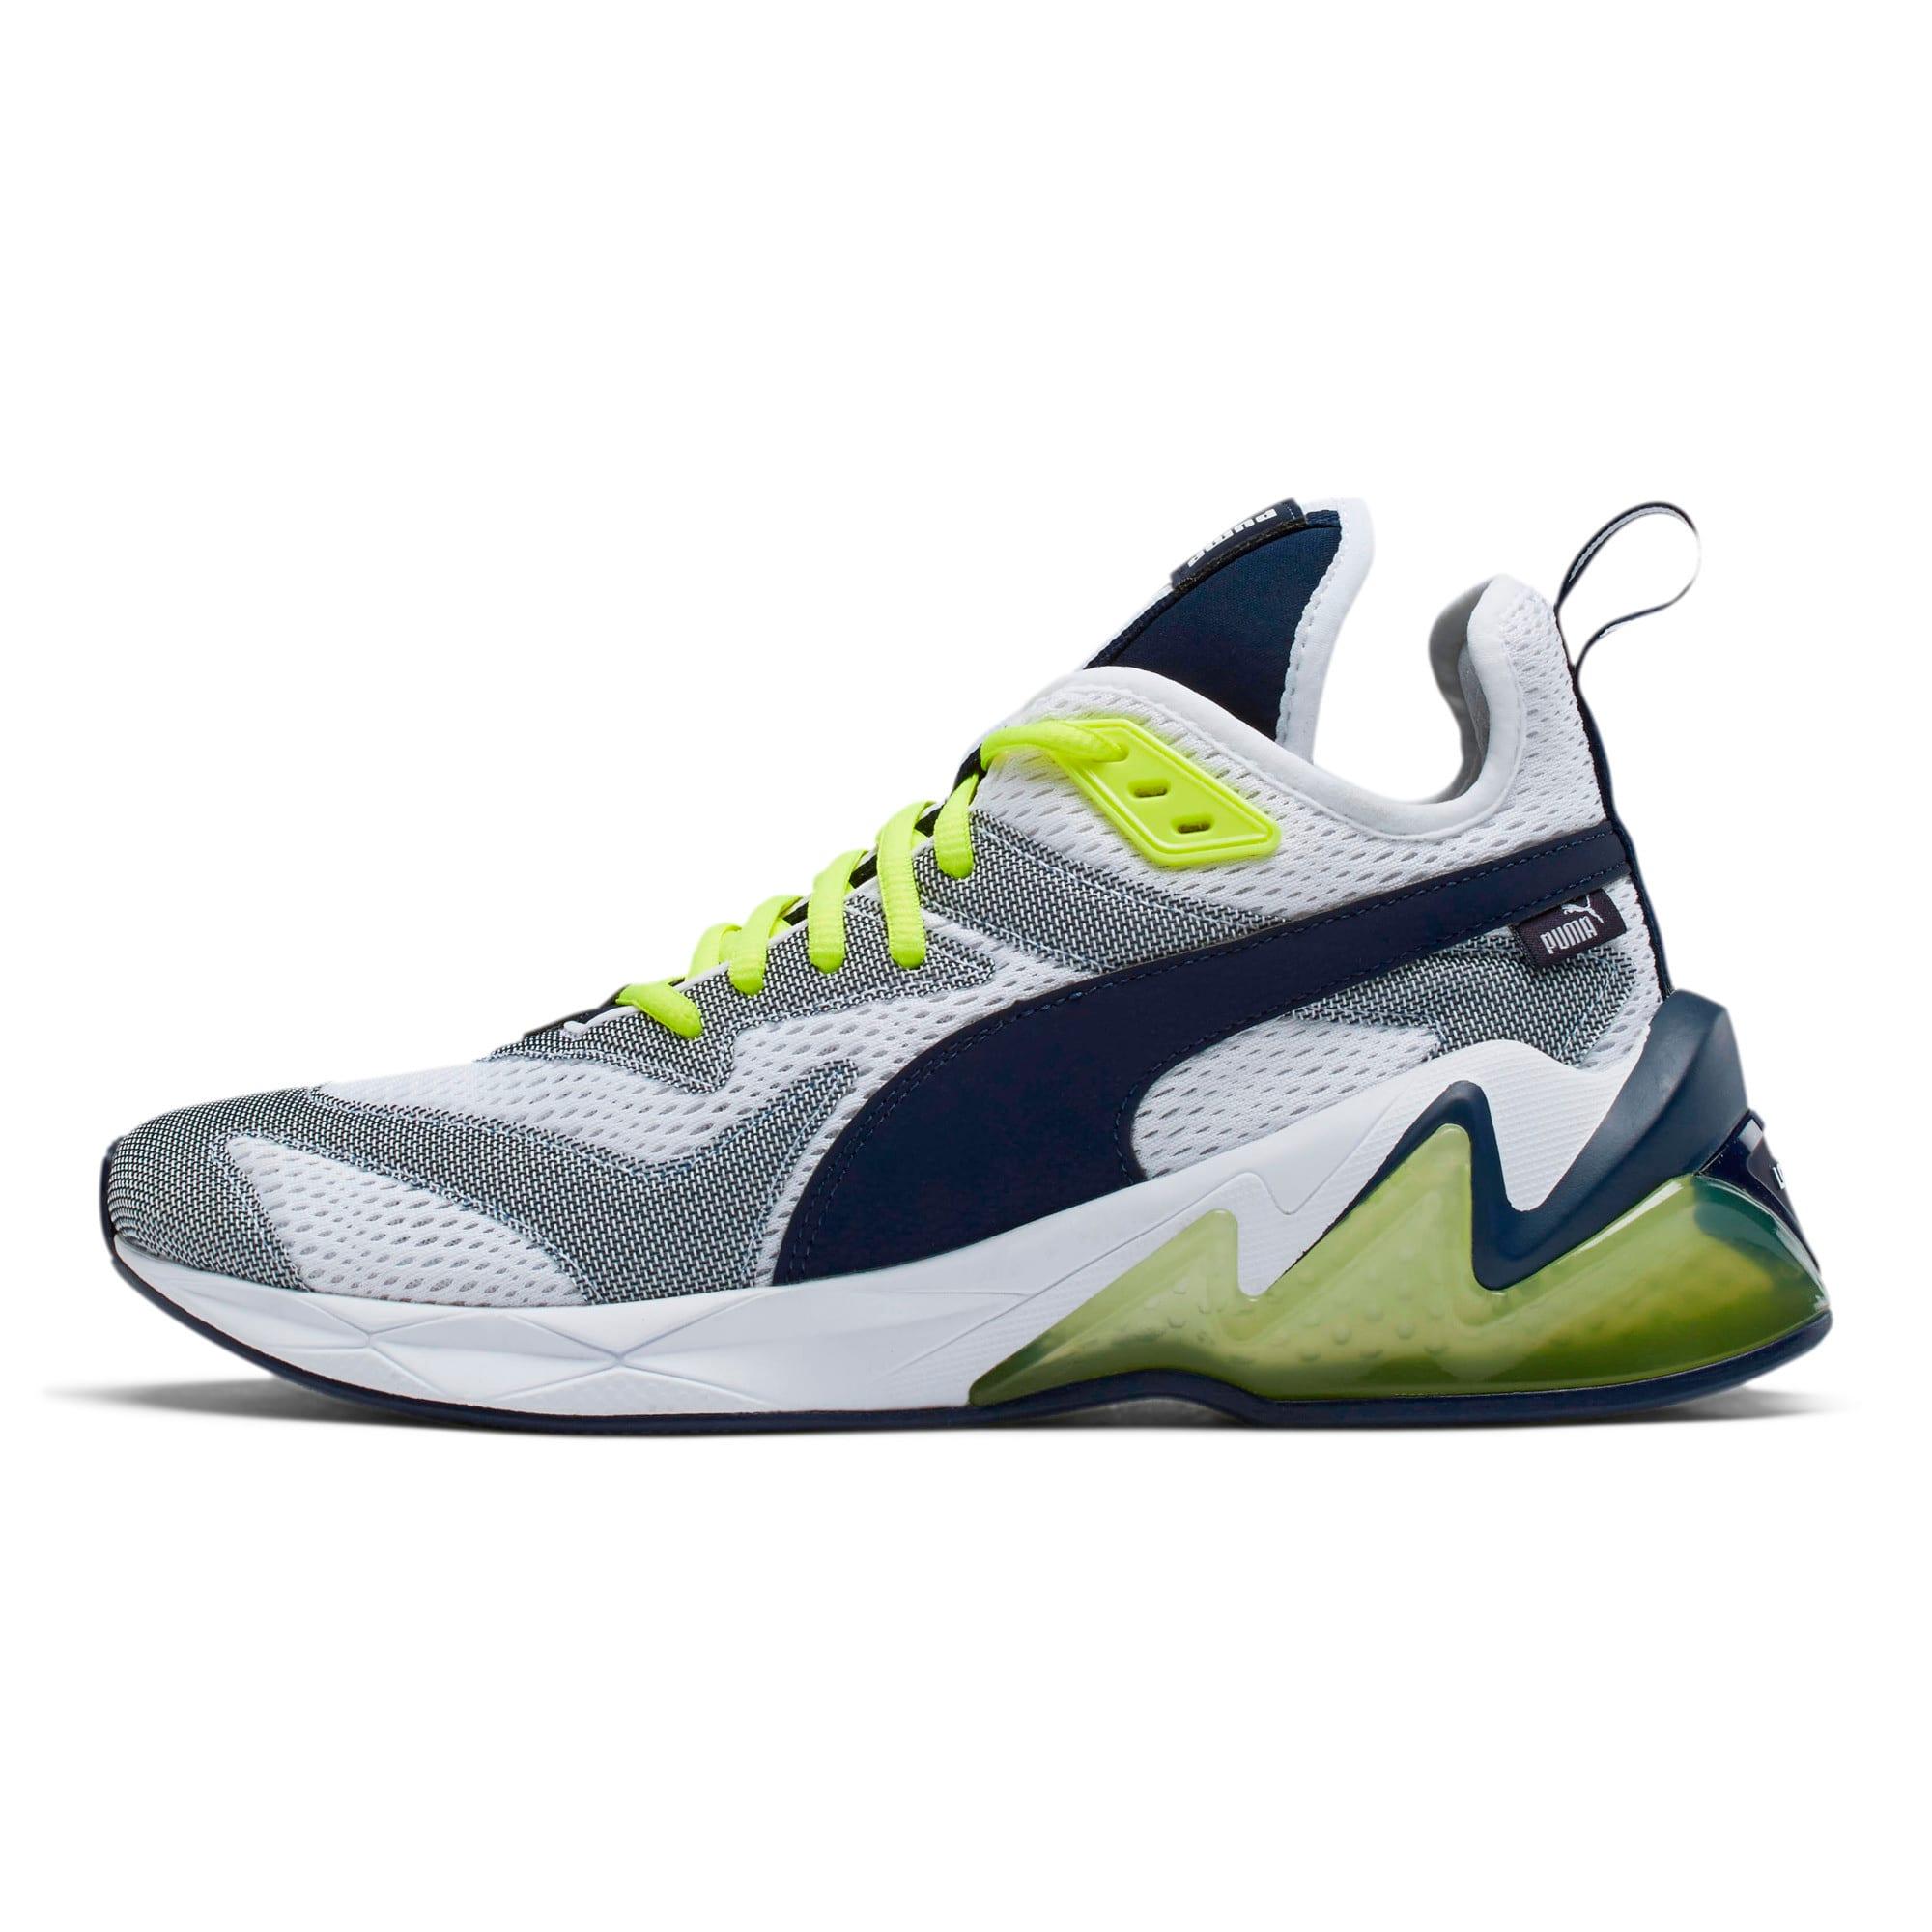 Thumbnail 1 of LQDCELL Origin Tech Men's Training Shoes, Puma White-Peacoat, medium